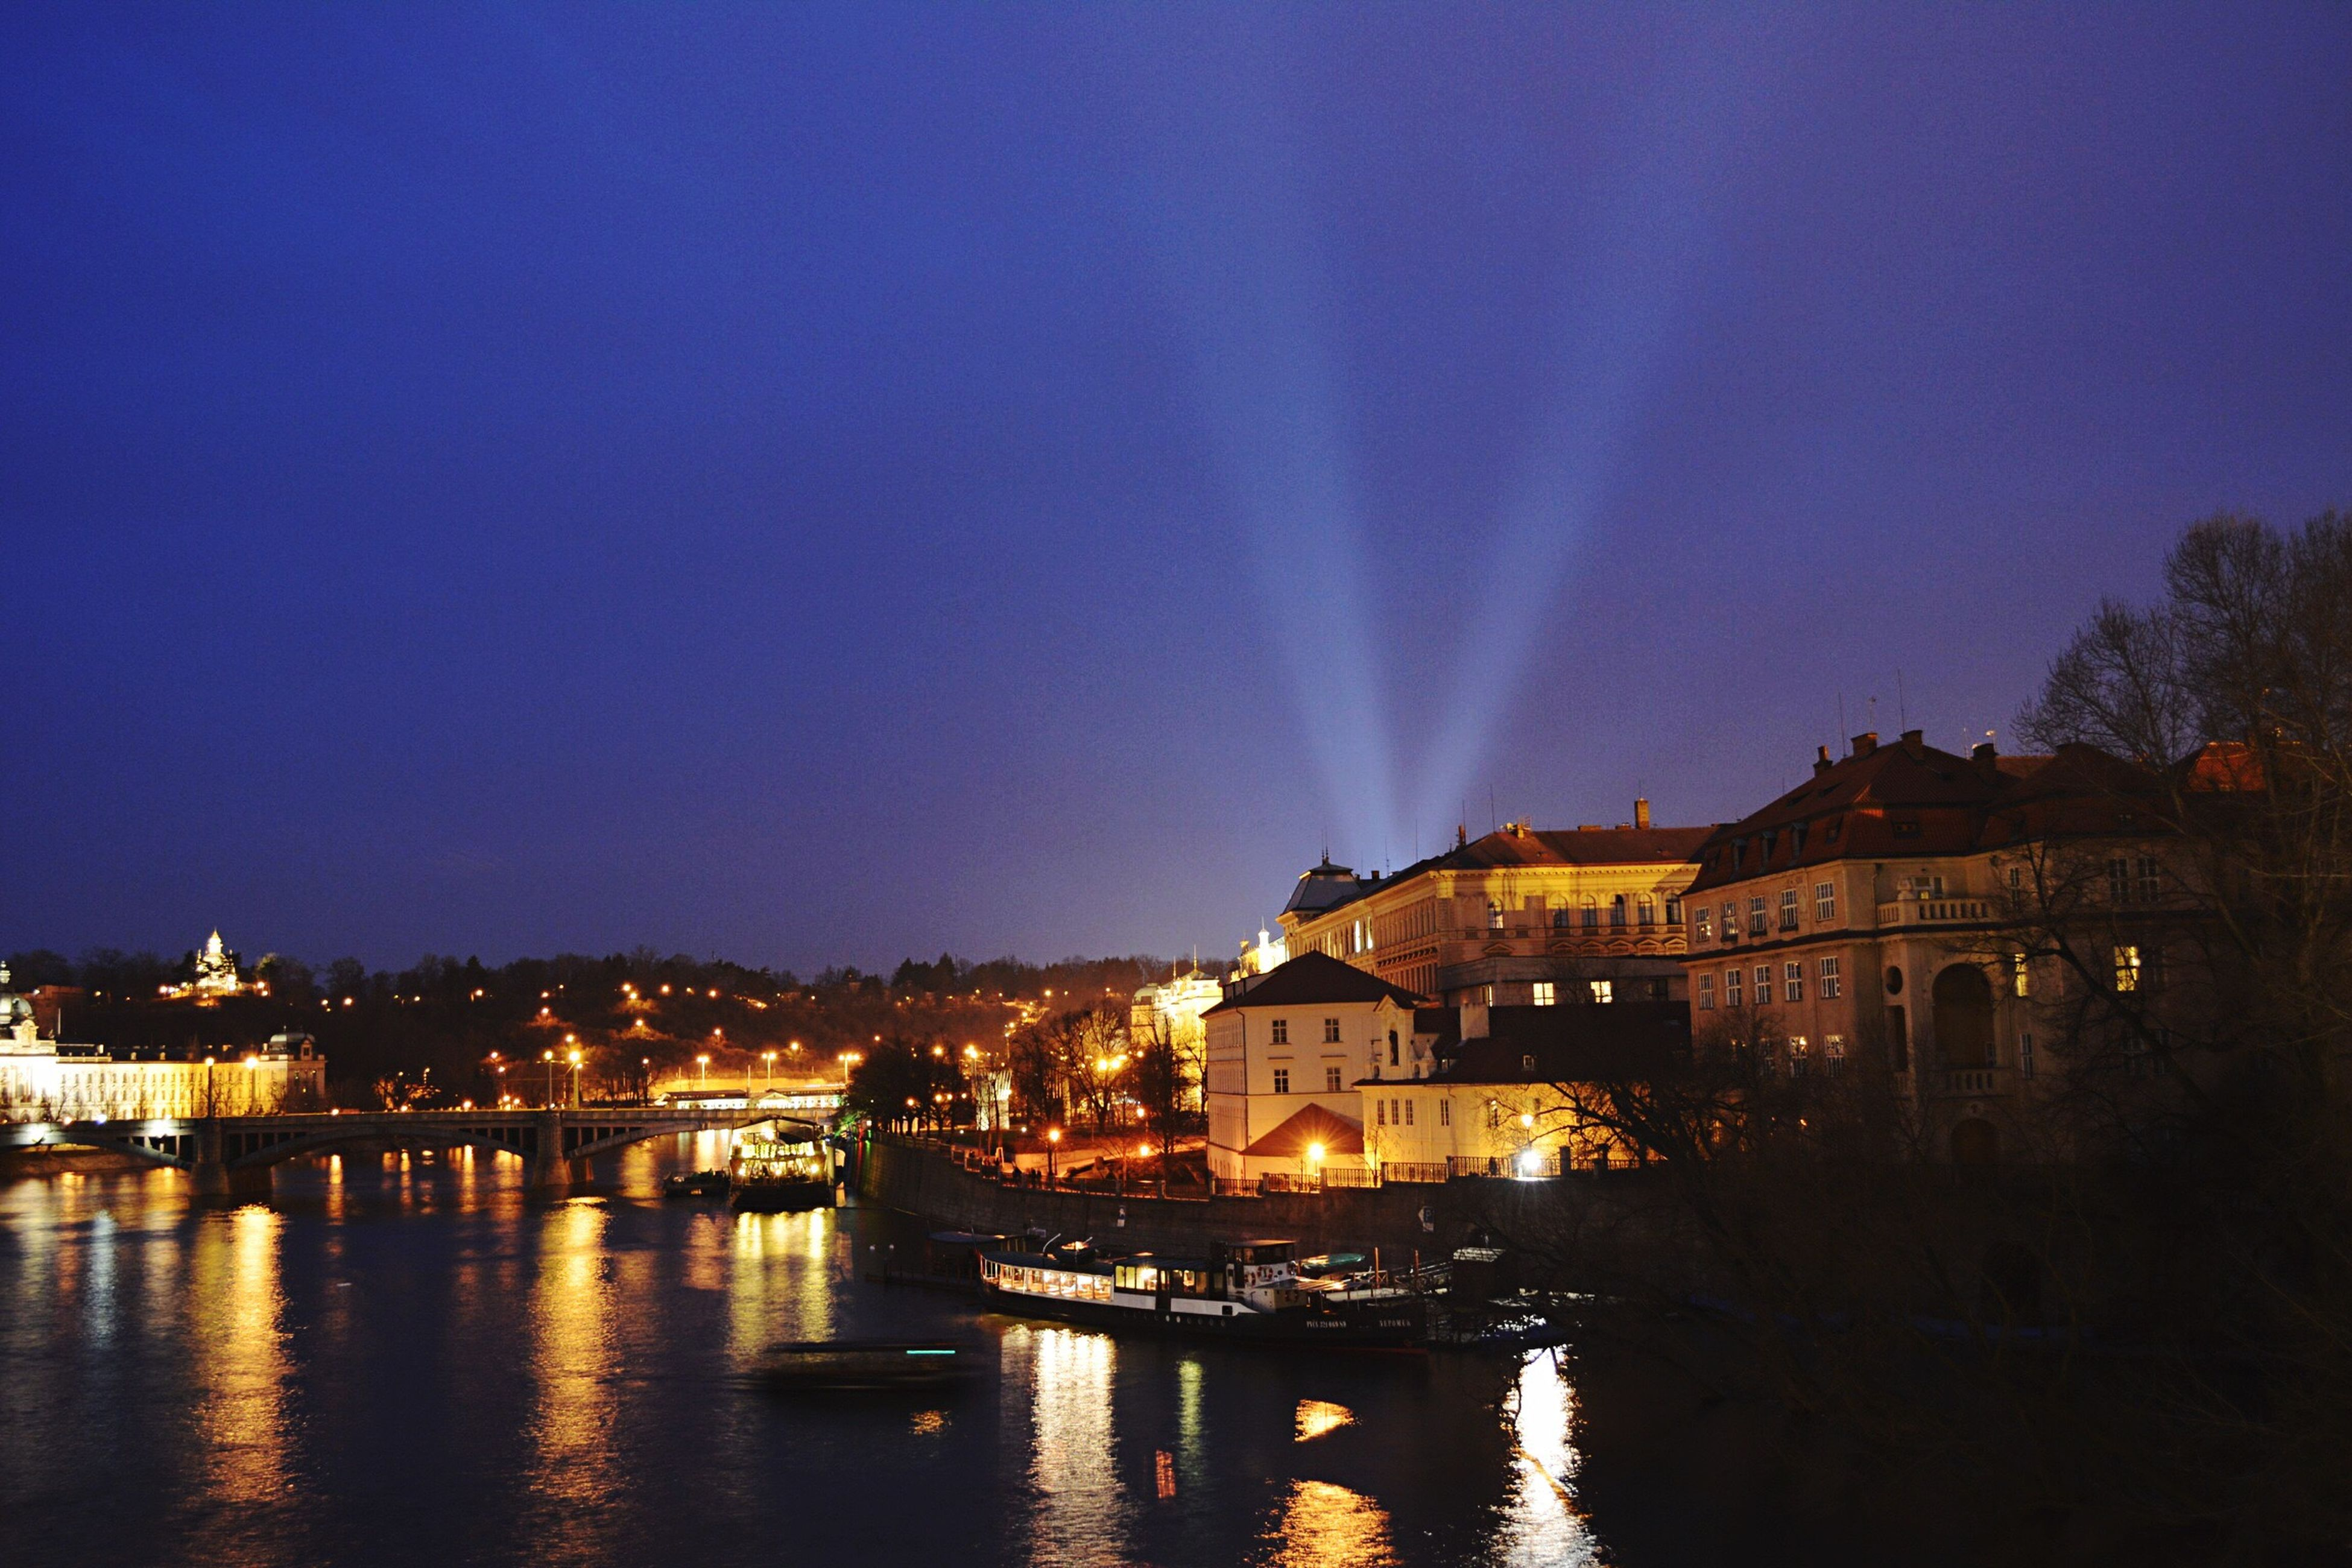 Prague Praga Charles Bridge River Night Lights Wonderful Landscape Ponte Carlo Fiume Luci